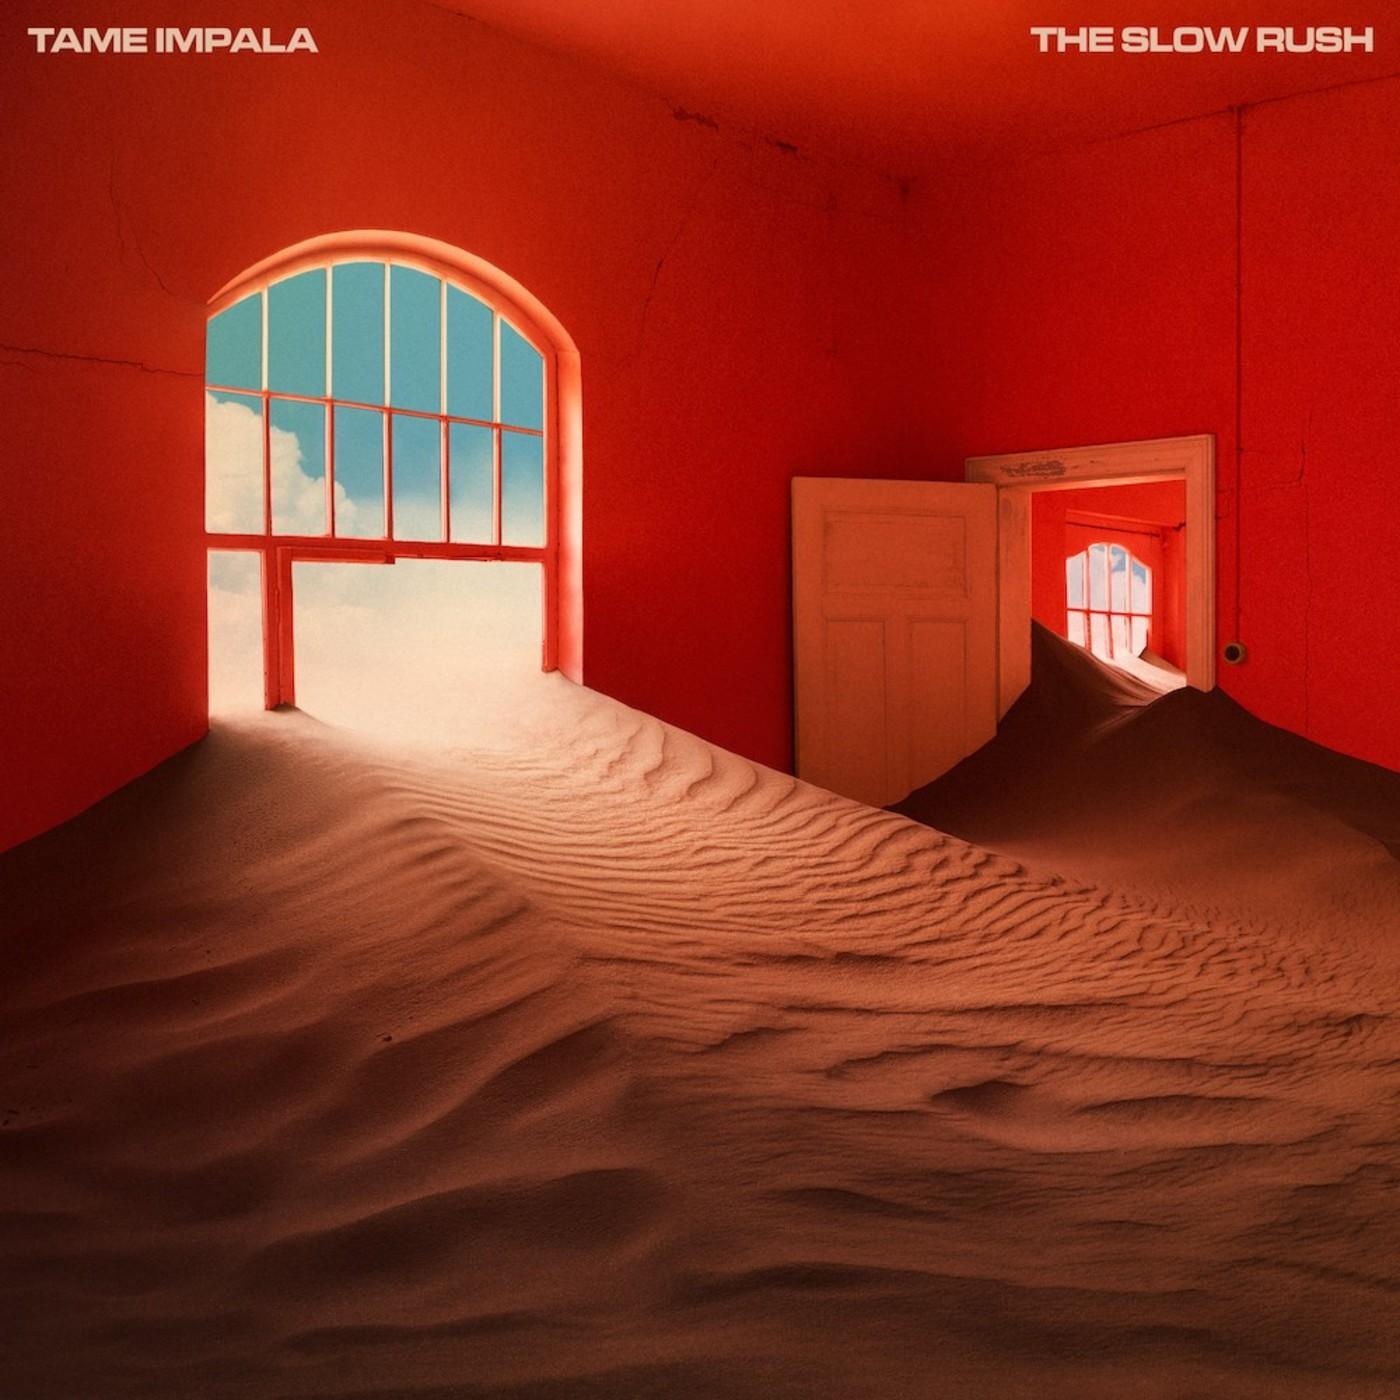 Tame Impala 'The Slow Rush'